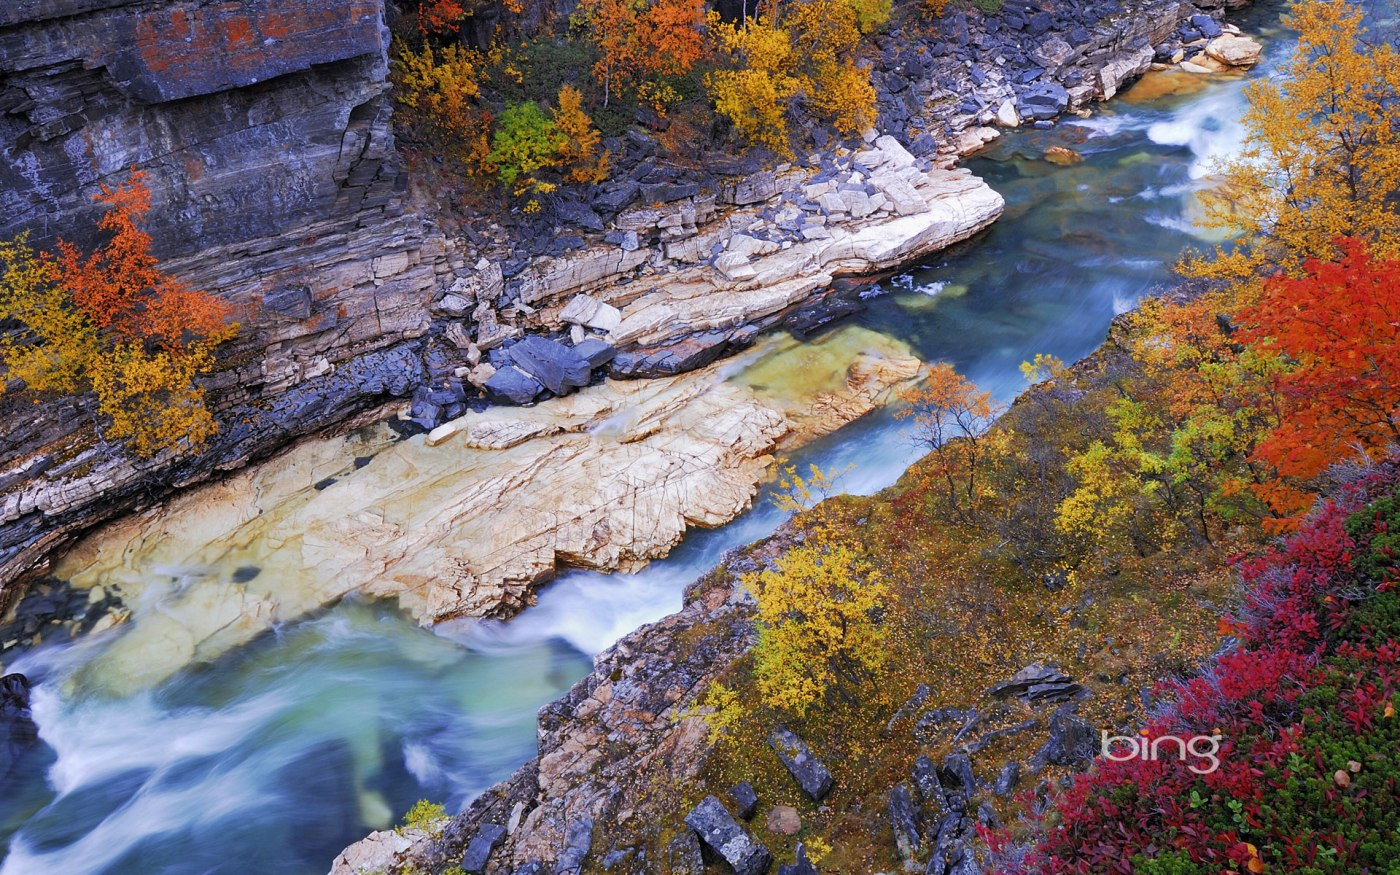 Autumn scenery along the Abiskojåkka River in Abisko National Park, Norrbotten, Lapland, Sweden